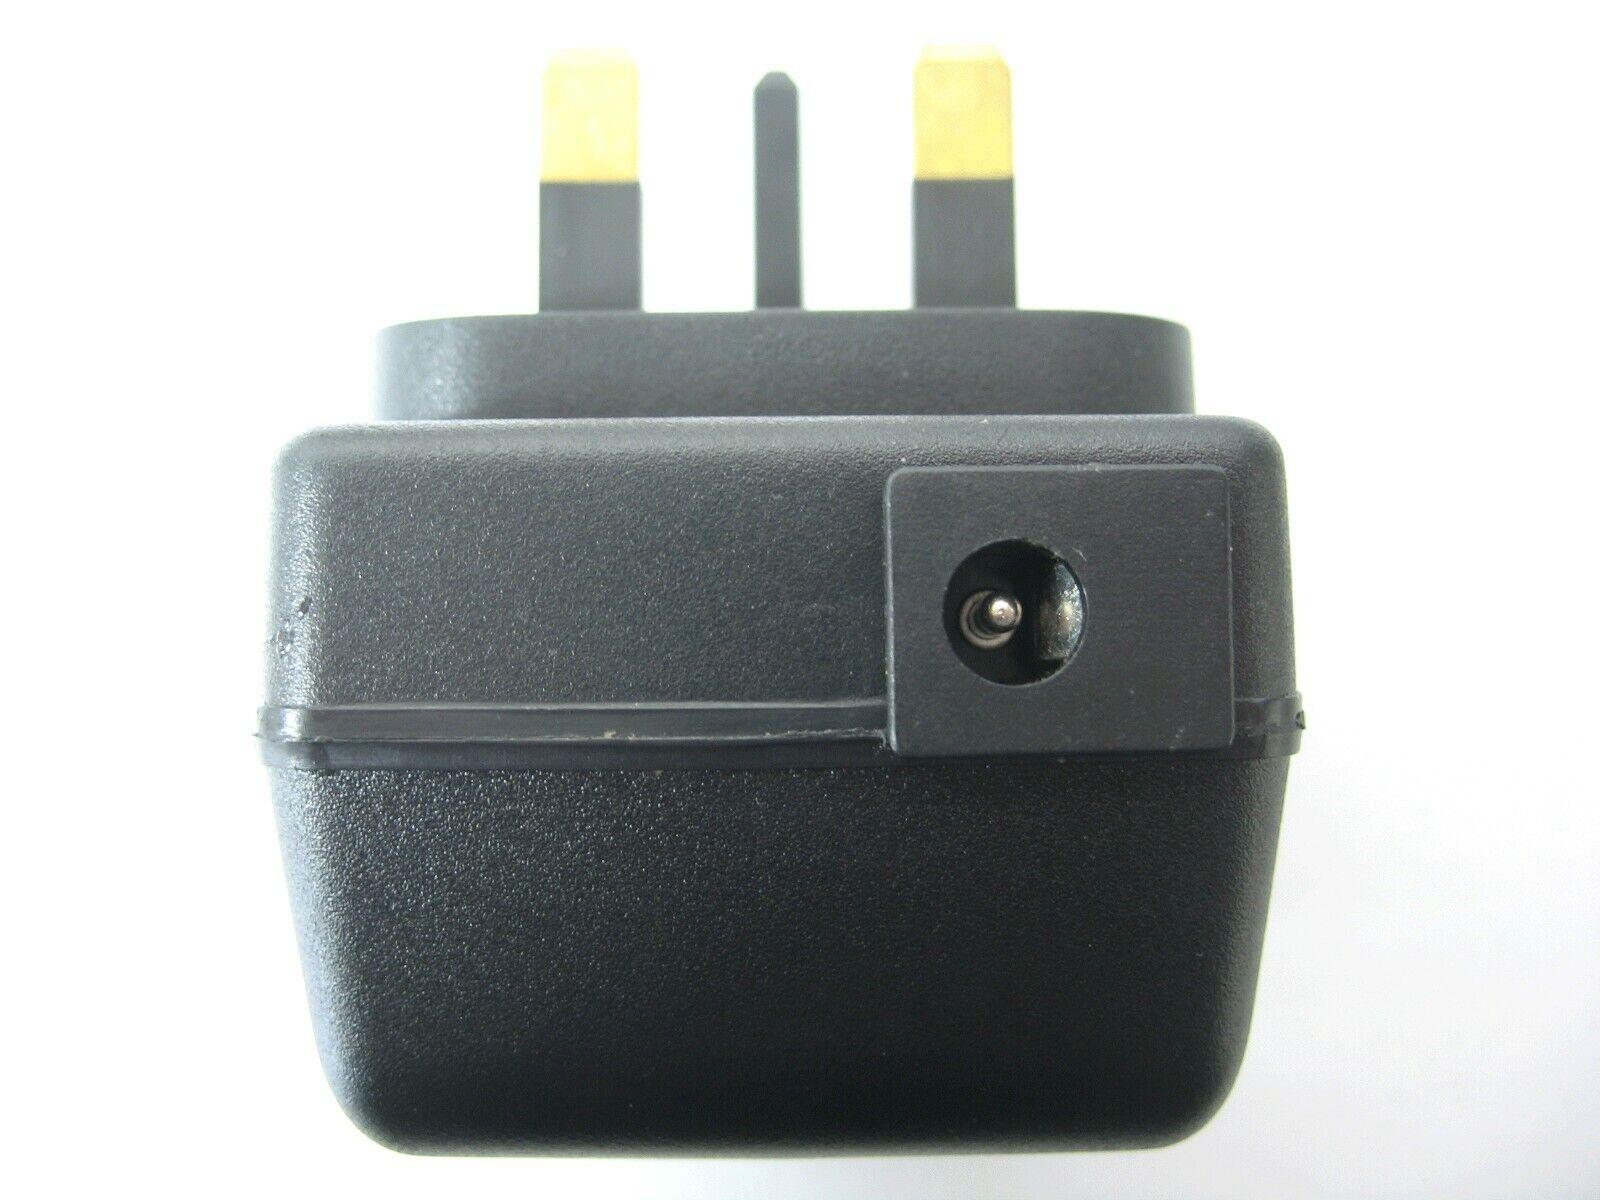 0.2 amp 30 volt Socket AC-DC (DC Output) Power Adaptor/Supply/Charger 6 watt